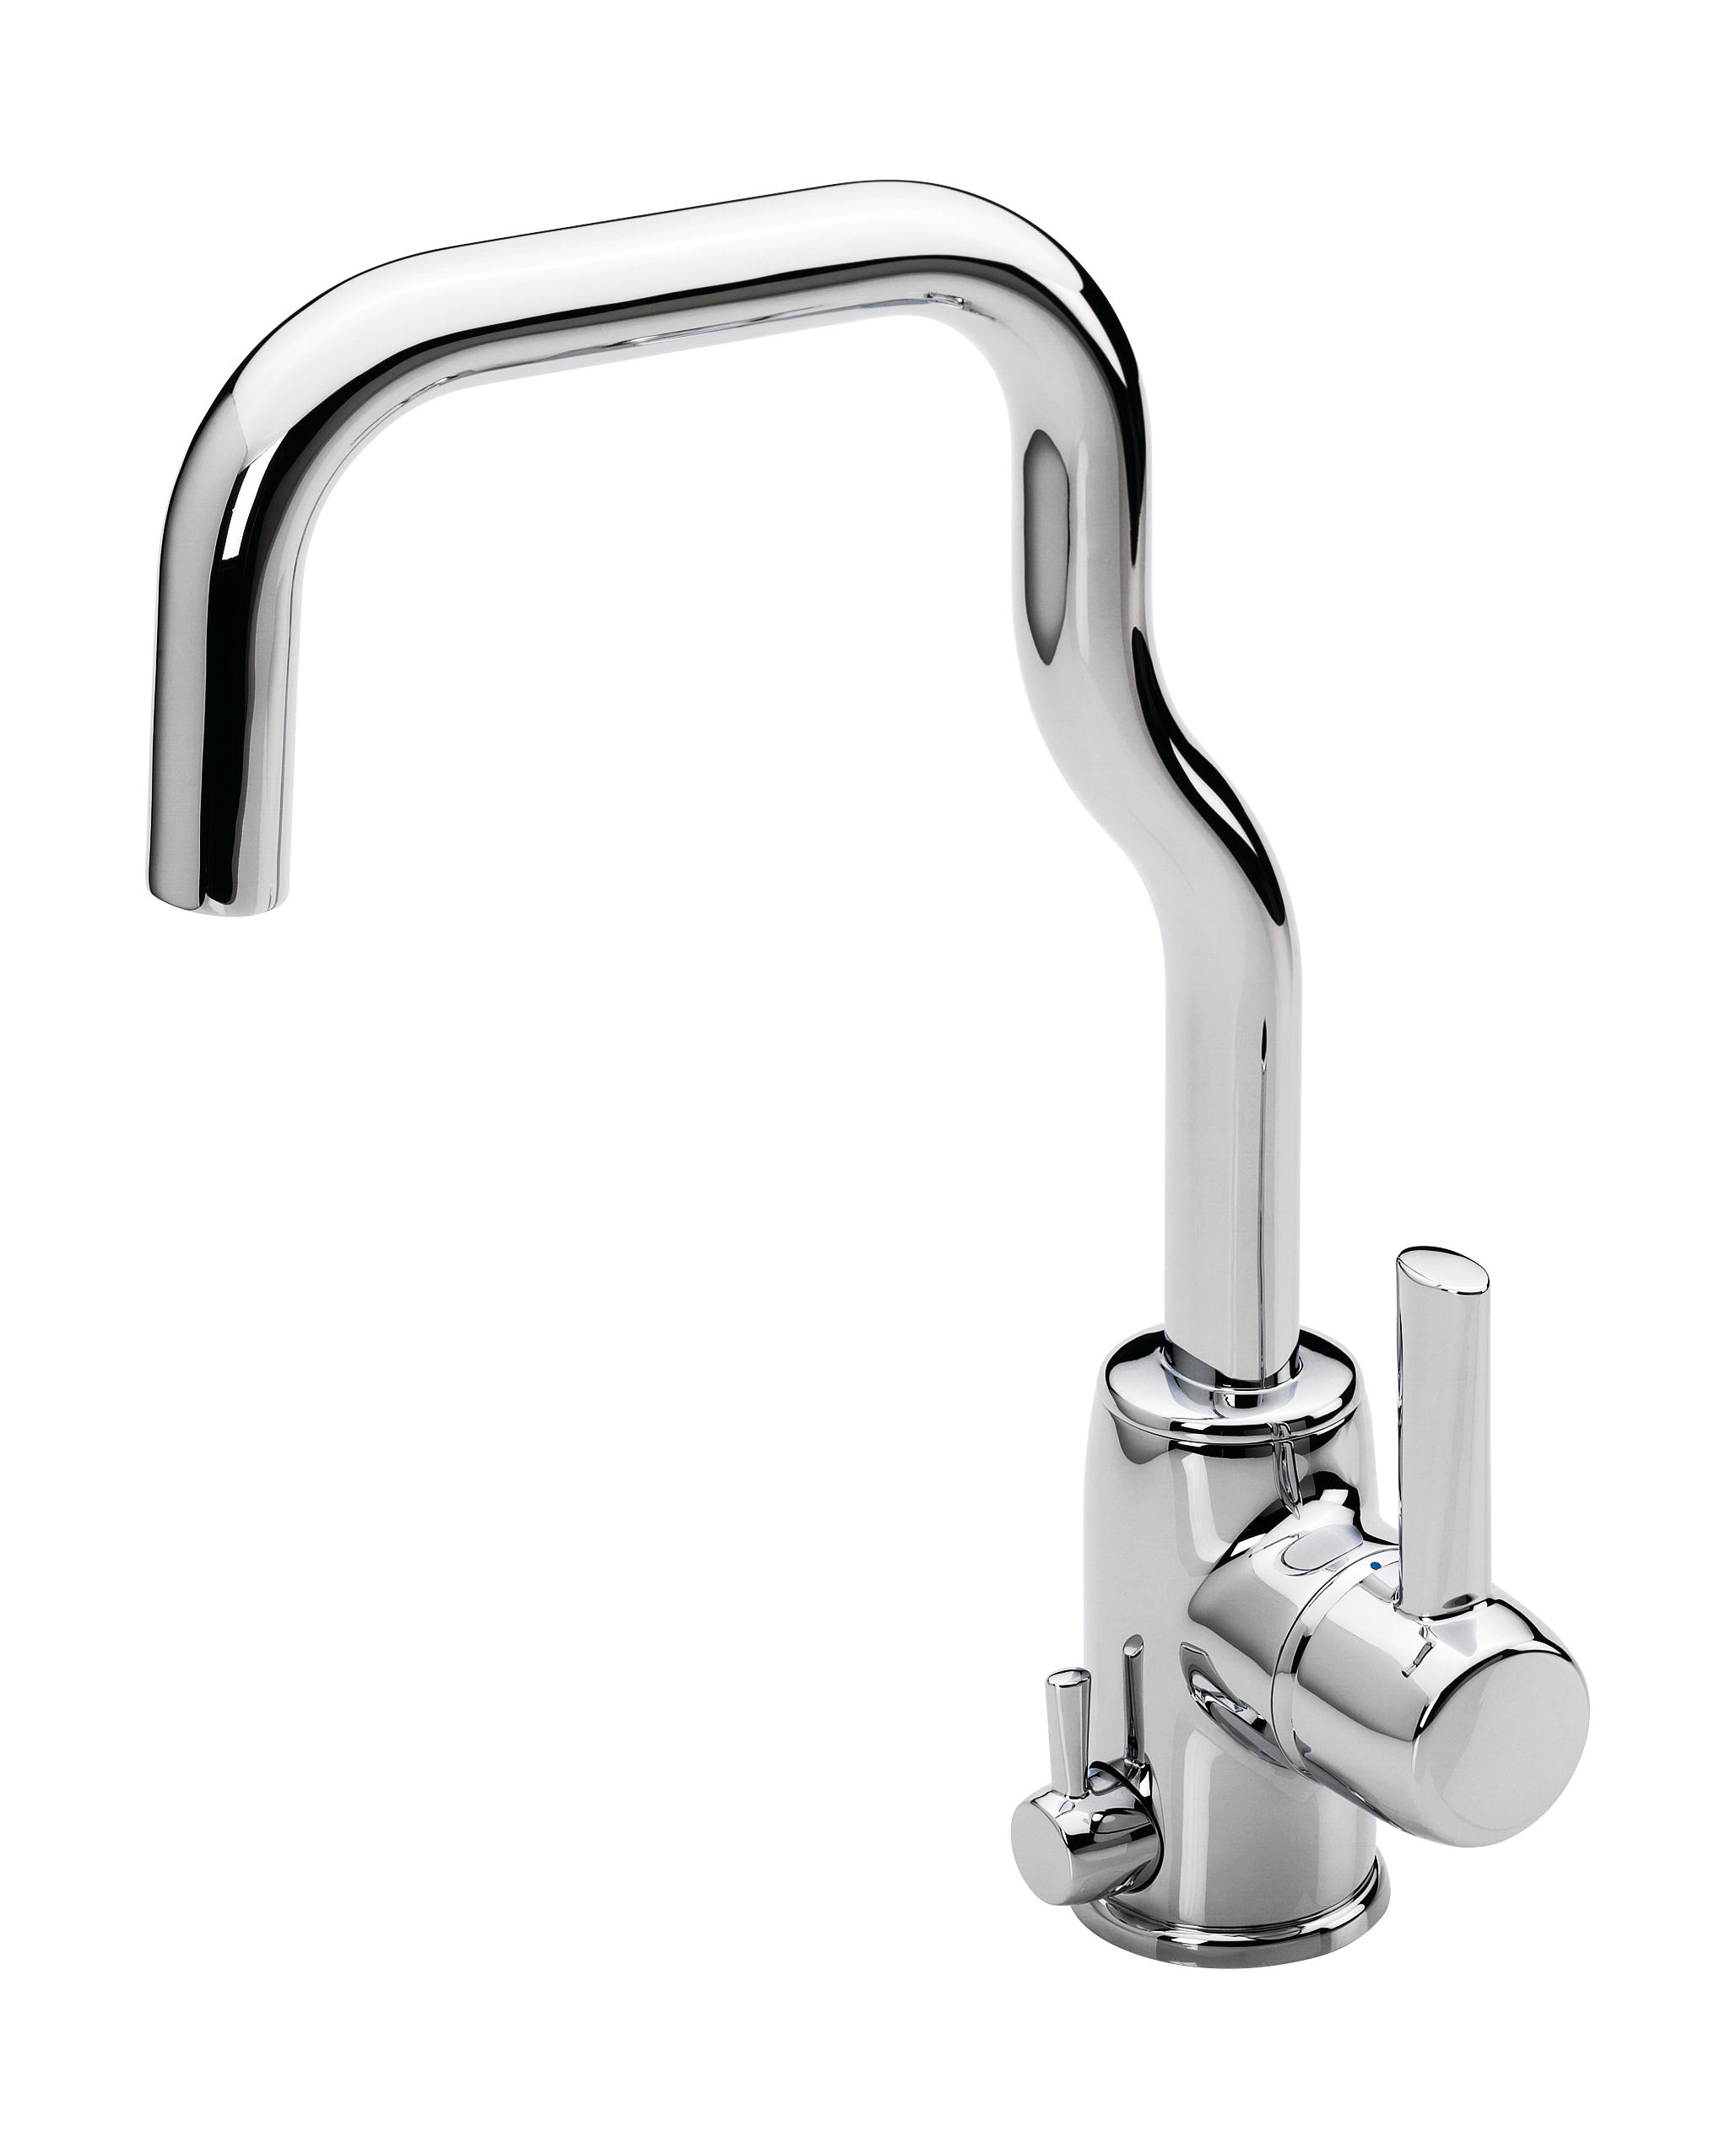 Elegant ... 8535F LA CUCINA ALESSI By Oras, Kitchen Faucet With Dishwasher Valve,  ...